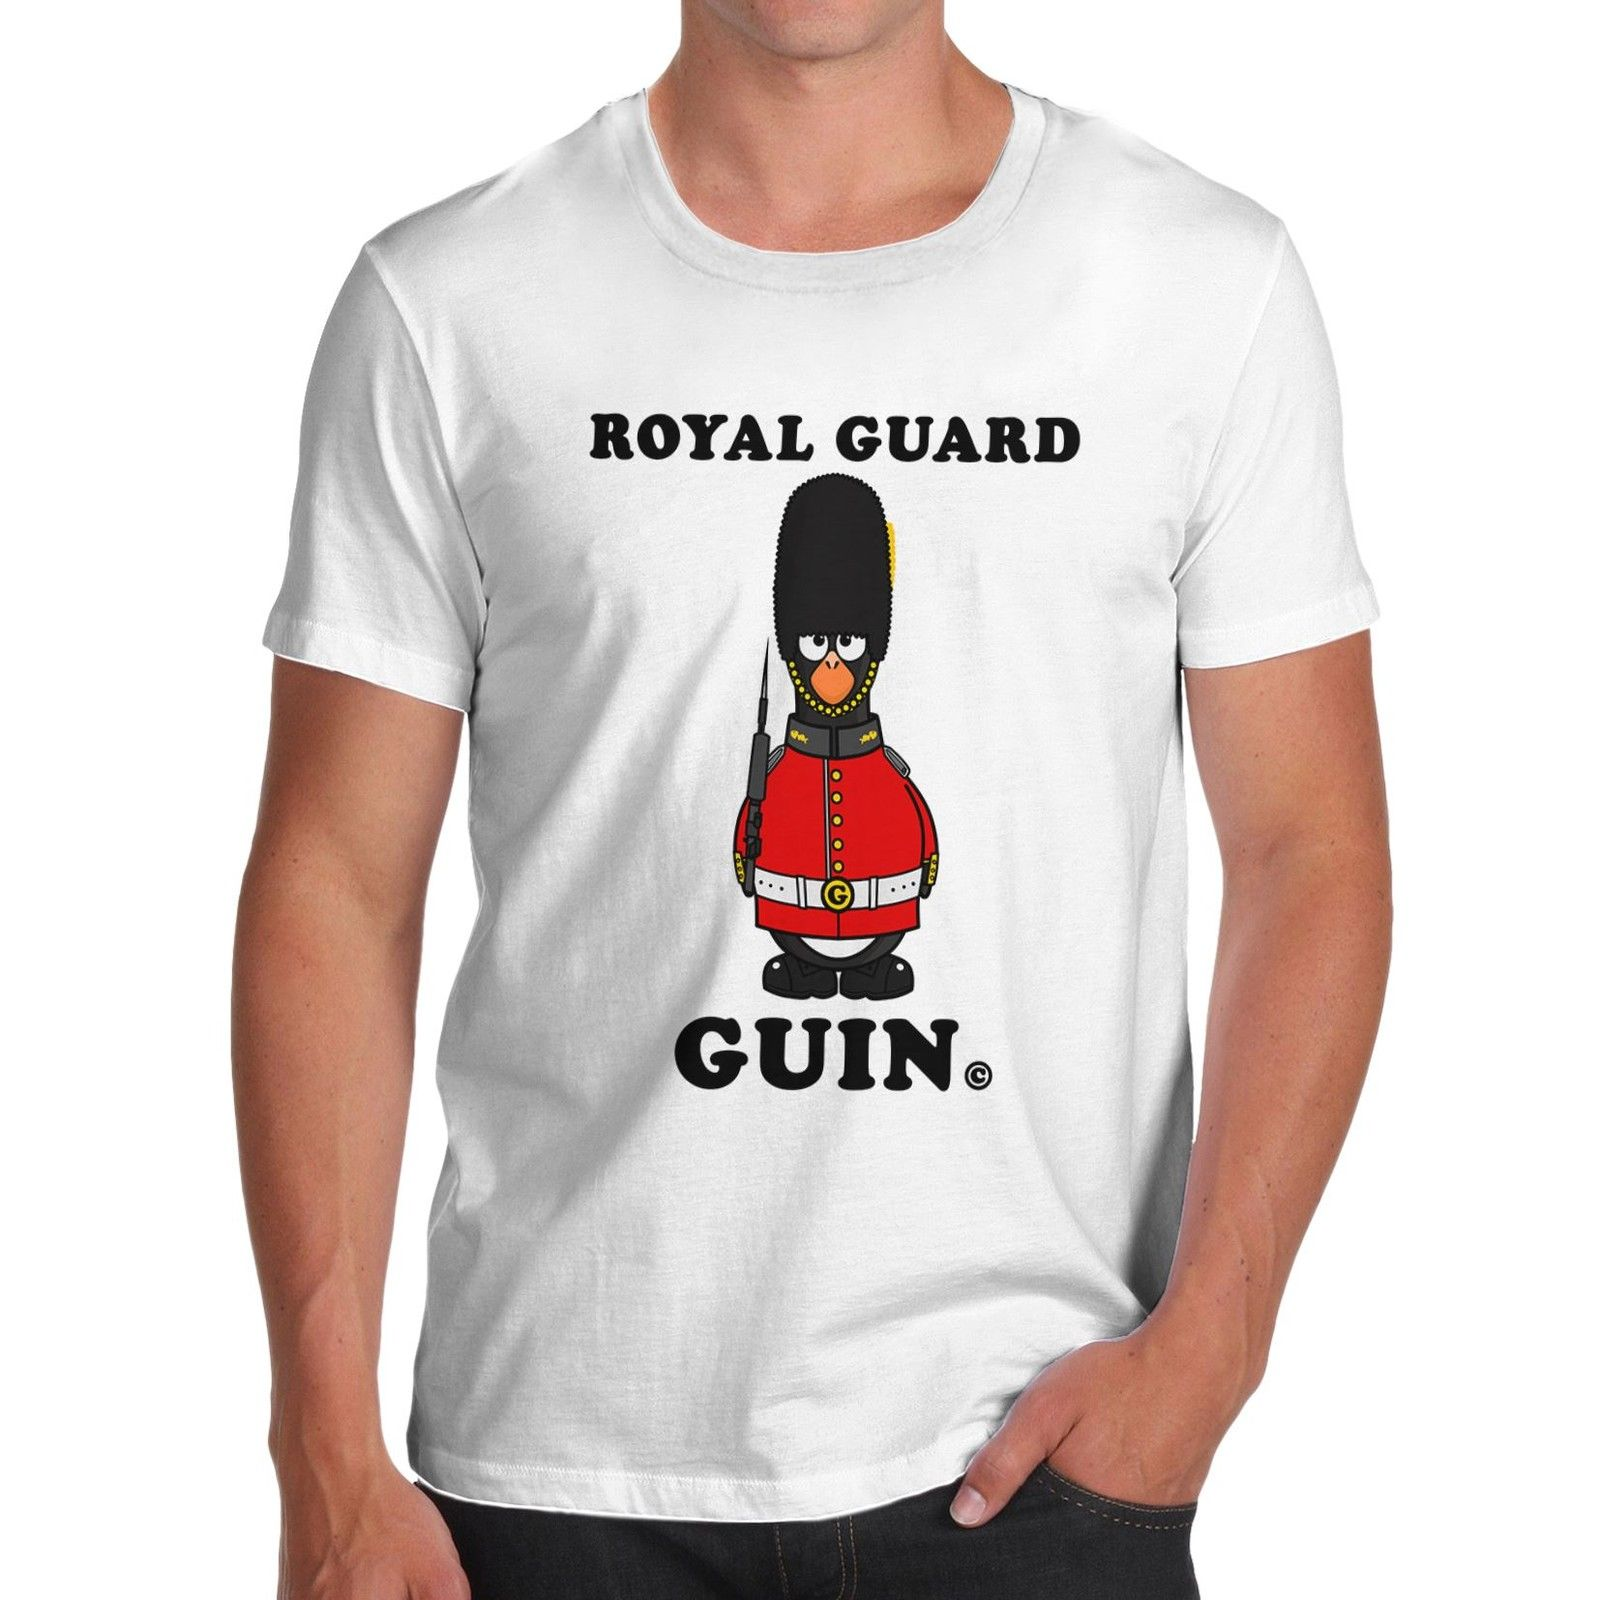 Shirt design london - T Shirt Men Print Mens Cotton Novelty Design London Theme Royal Guard Guin T Shirt White